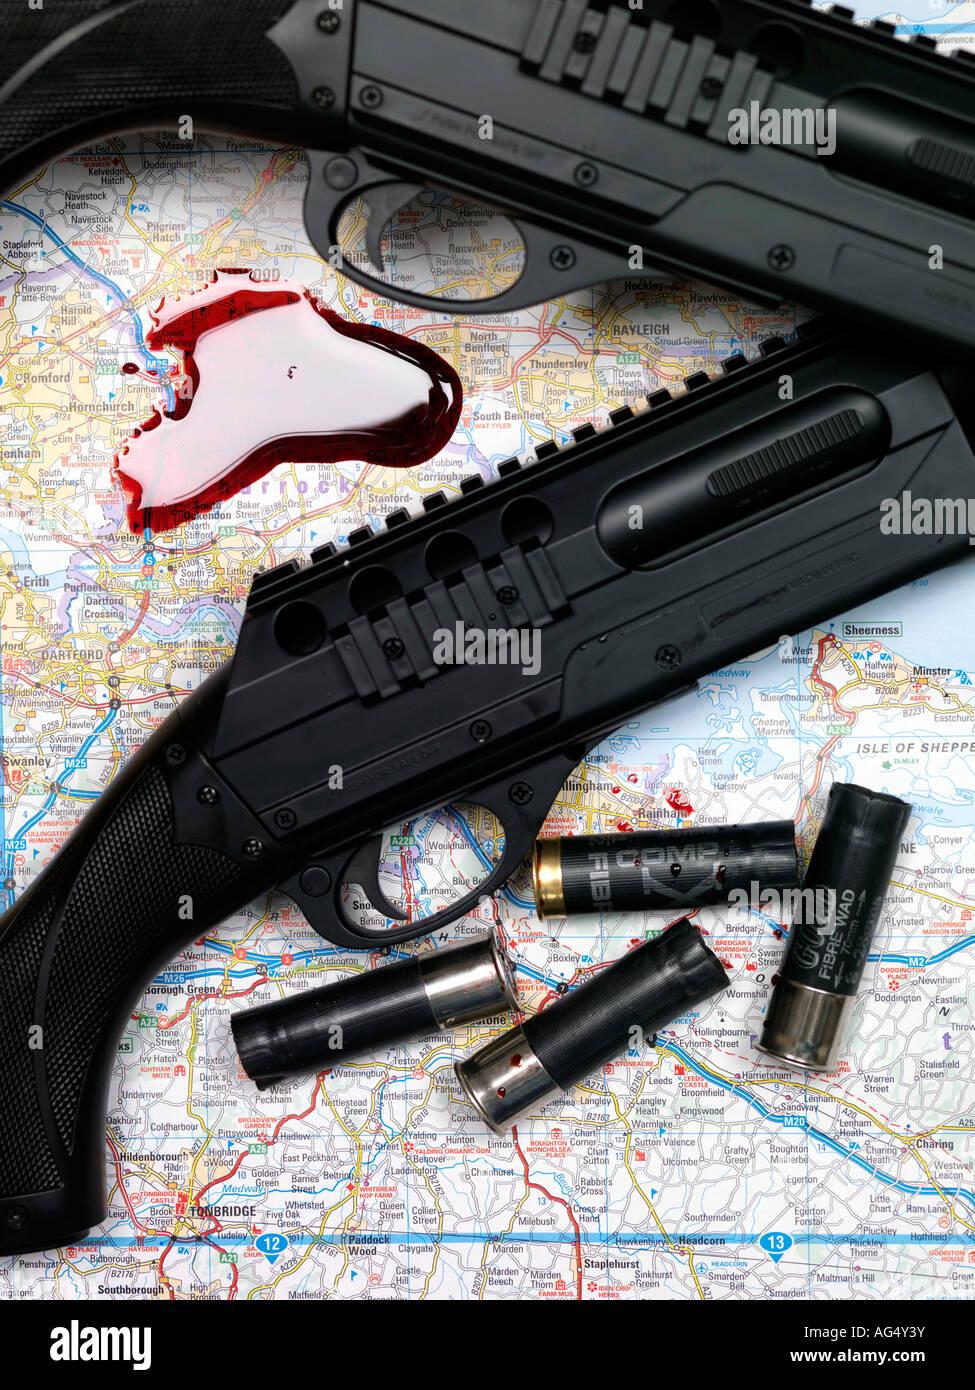 Pump Action Shotguns - Stock Image